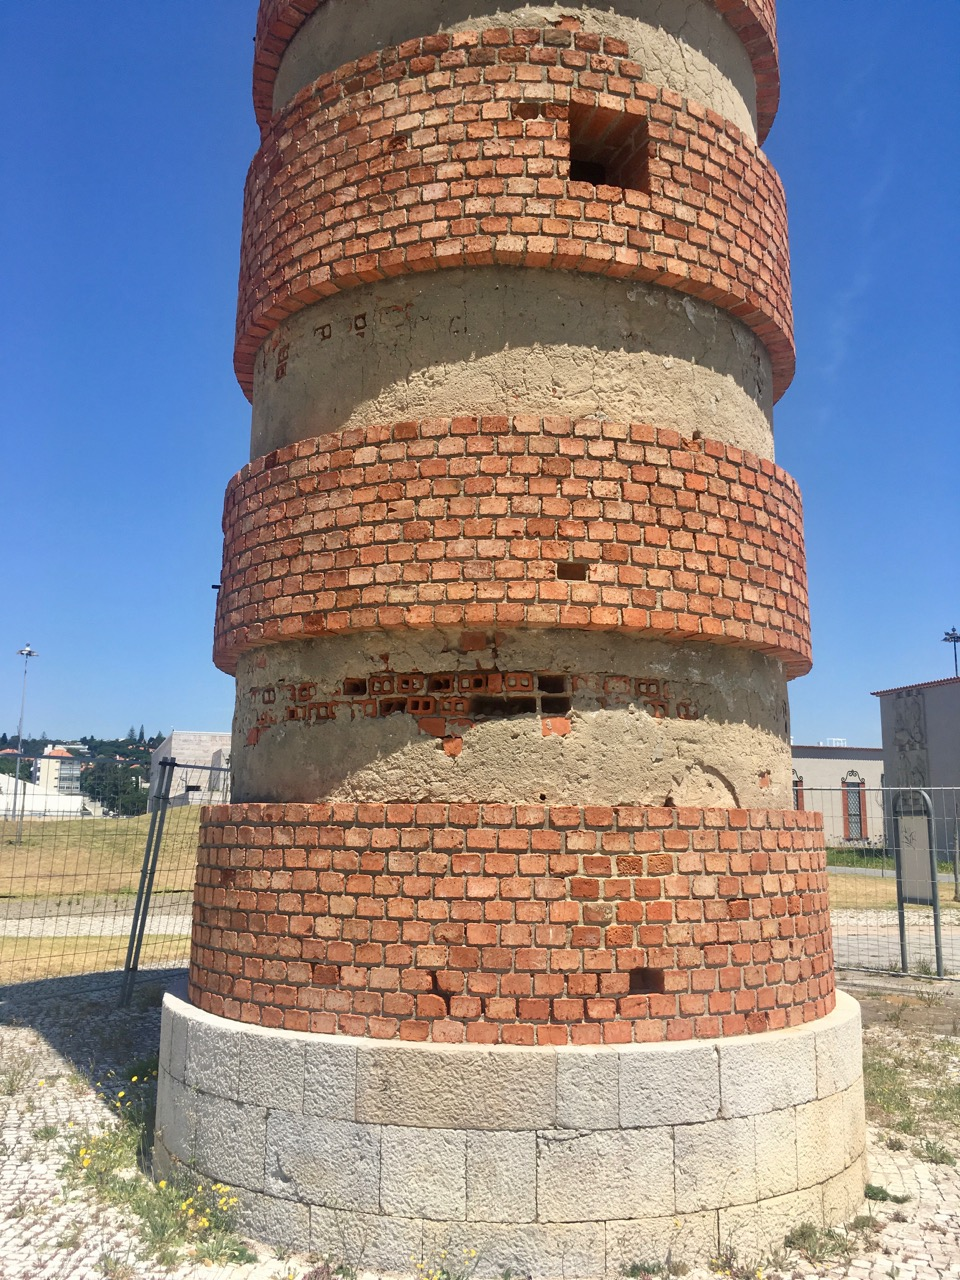 A closer look at the brickwork